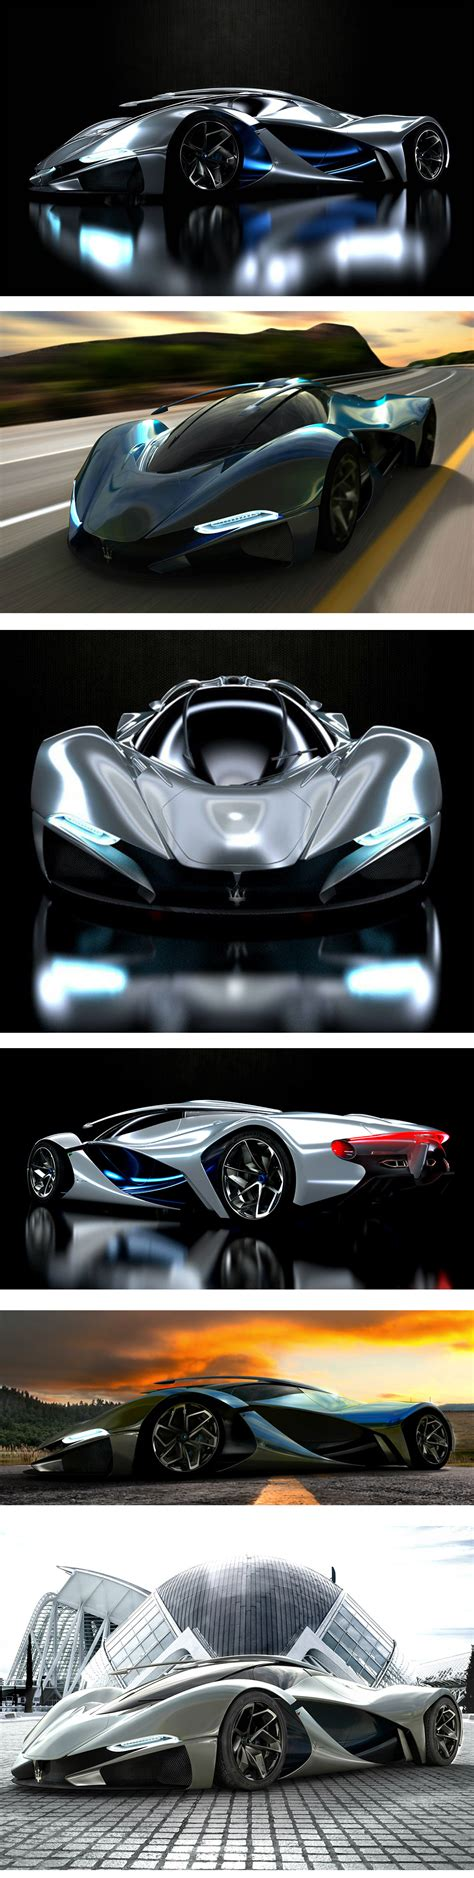 Maserati LaMaserati Concept Car | Concept cars, Super cars ...